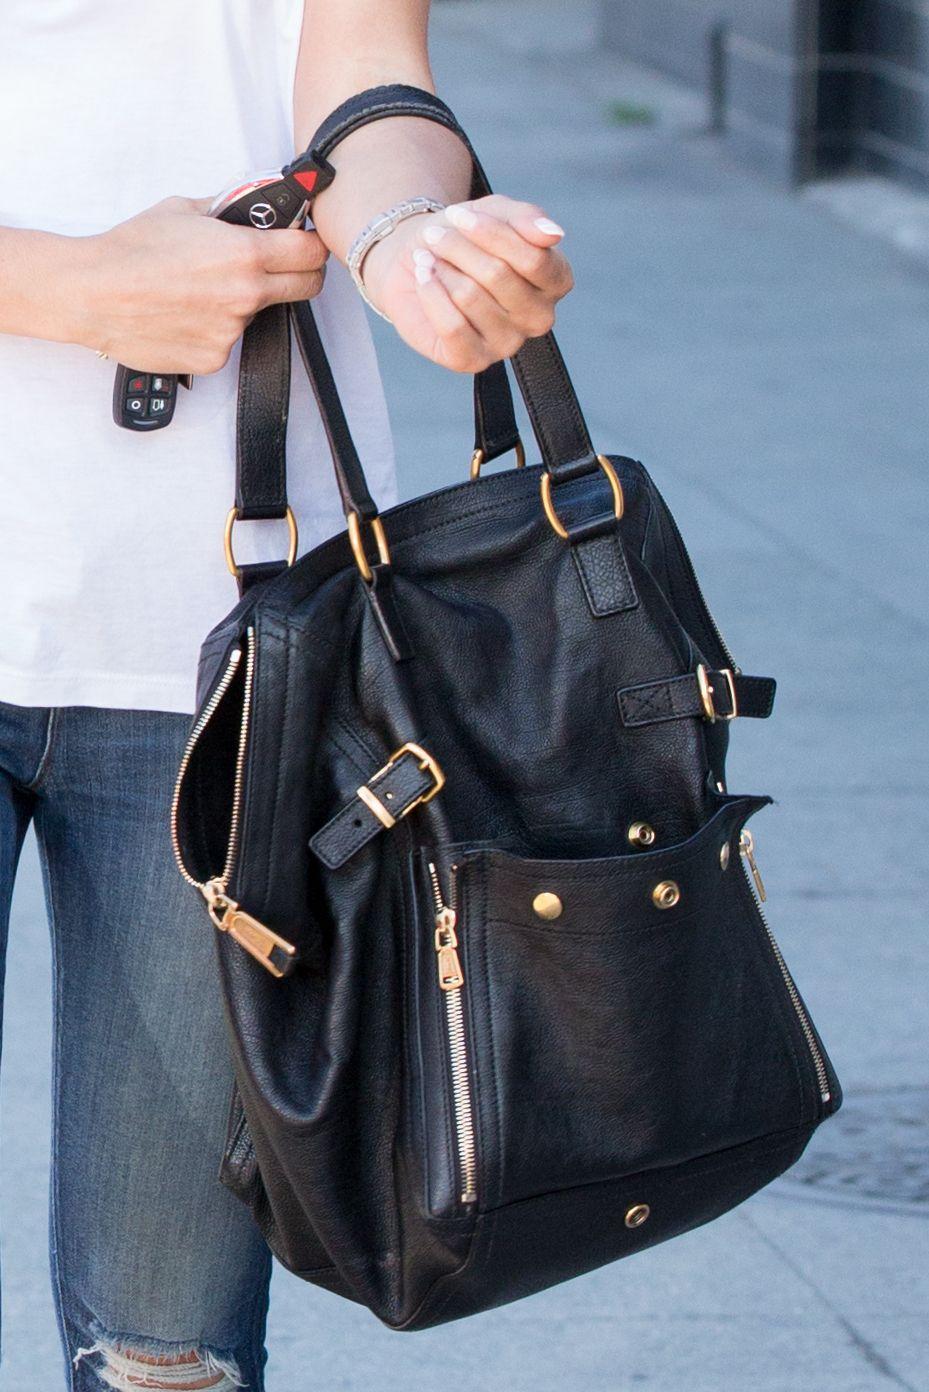 c56ed0f7030 YSL Downtown Bag | Cara Disclothed | Bags, Tote handbags, Ysl